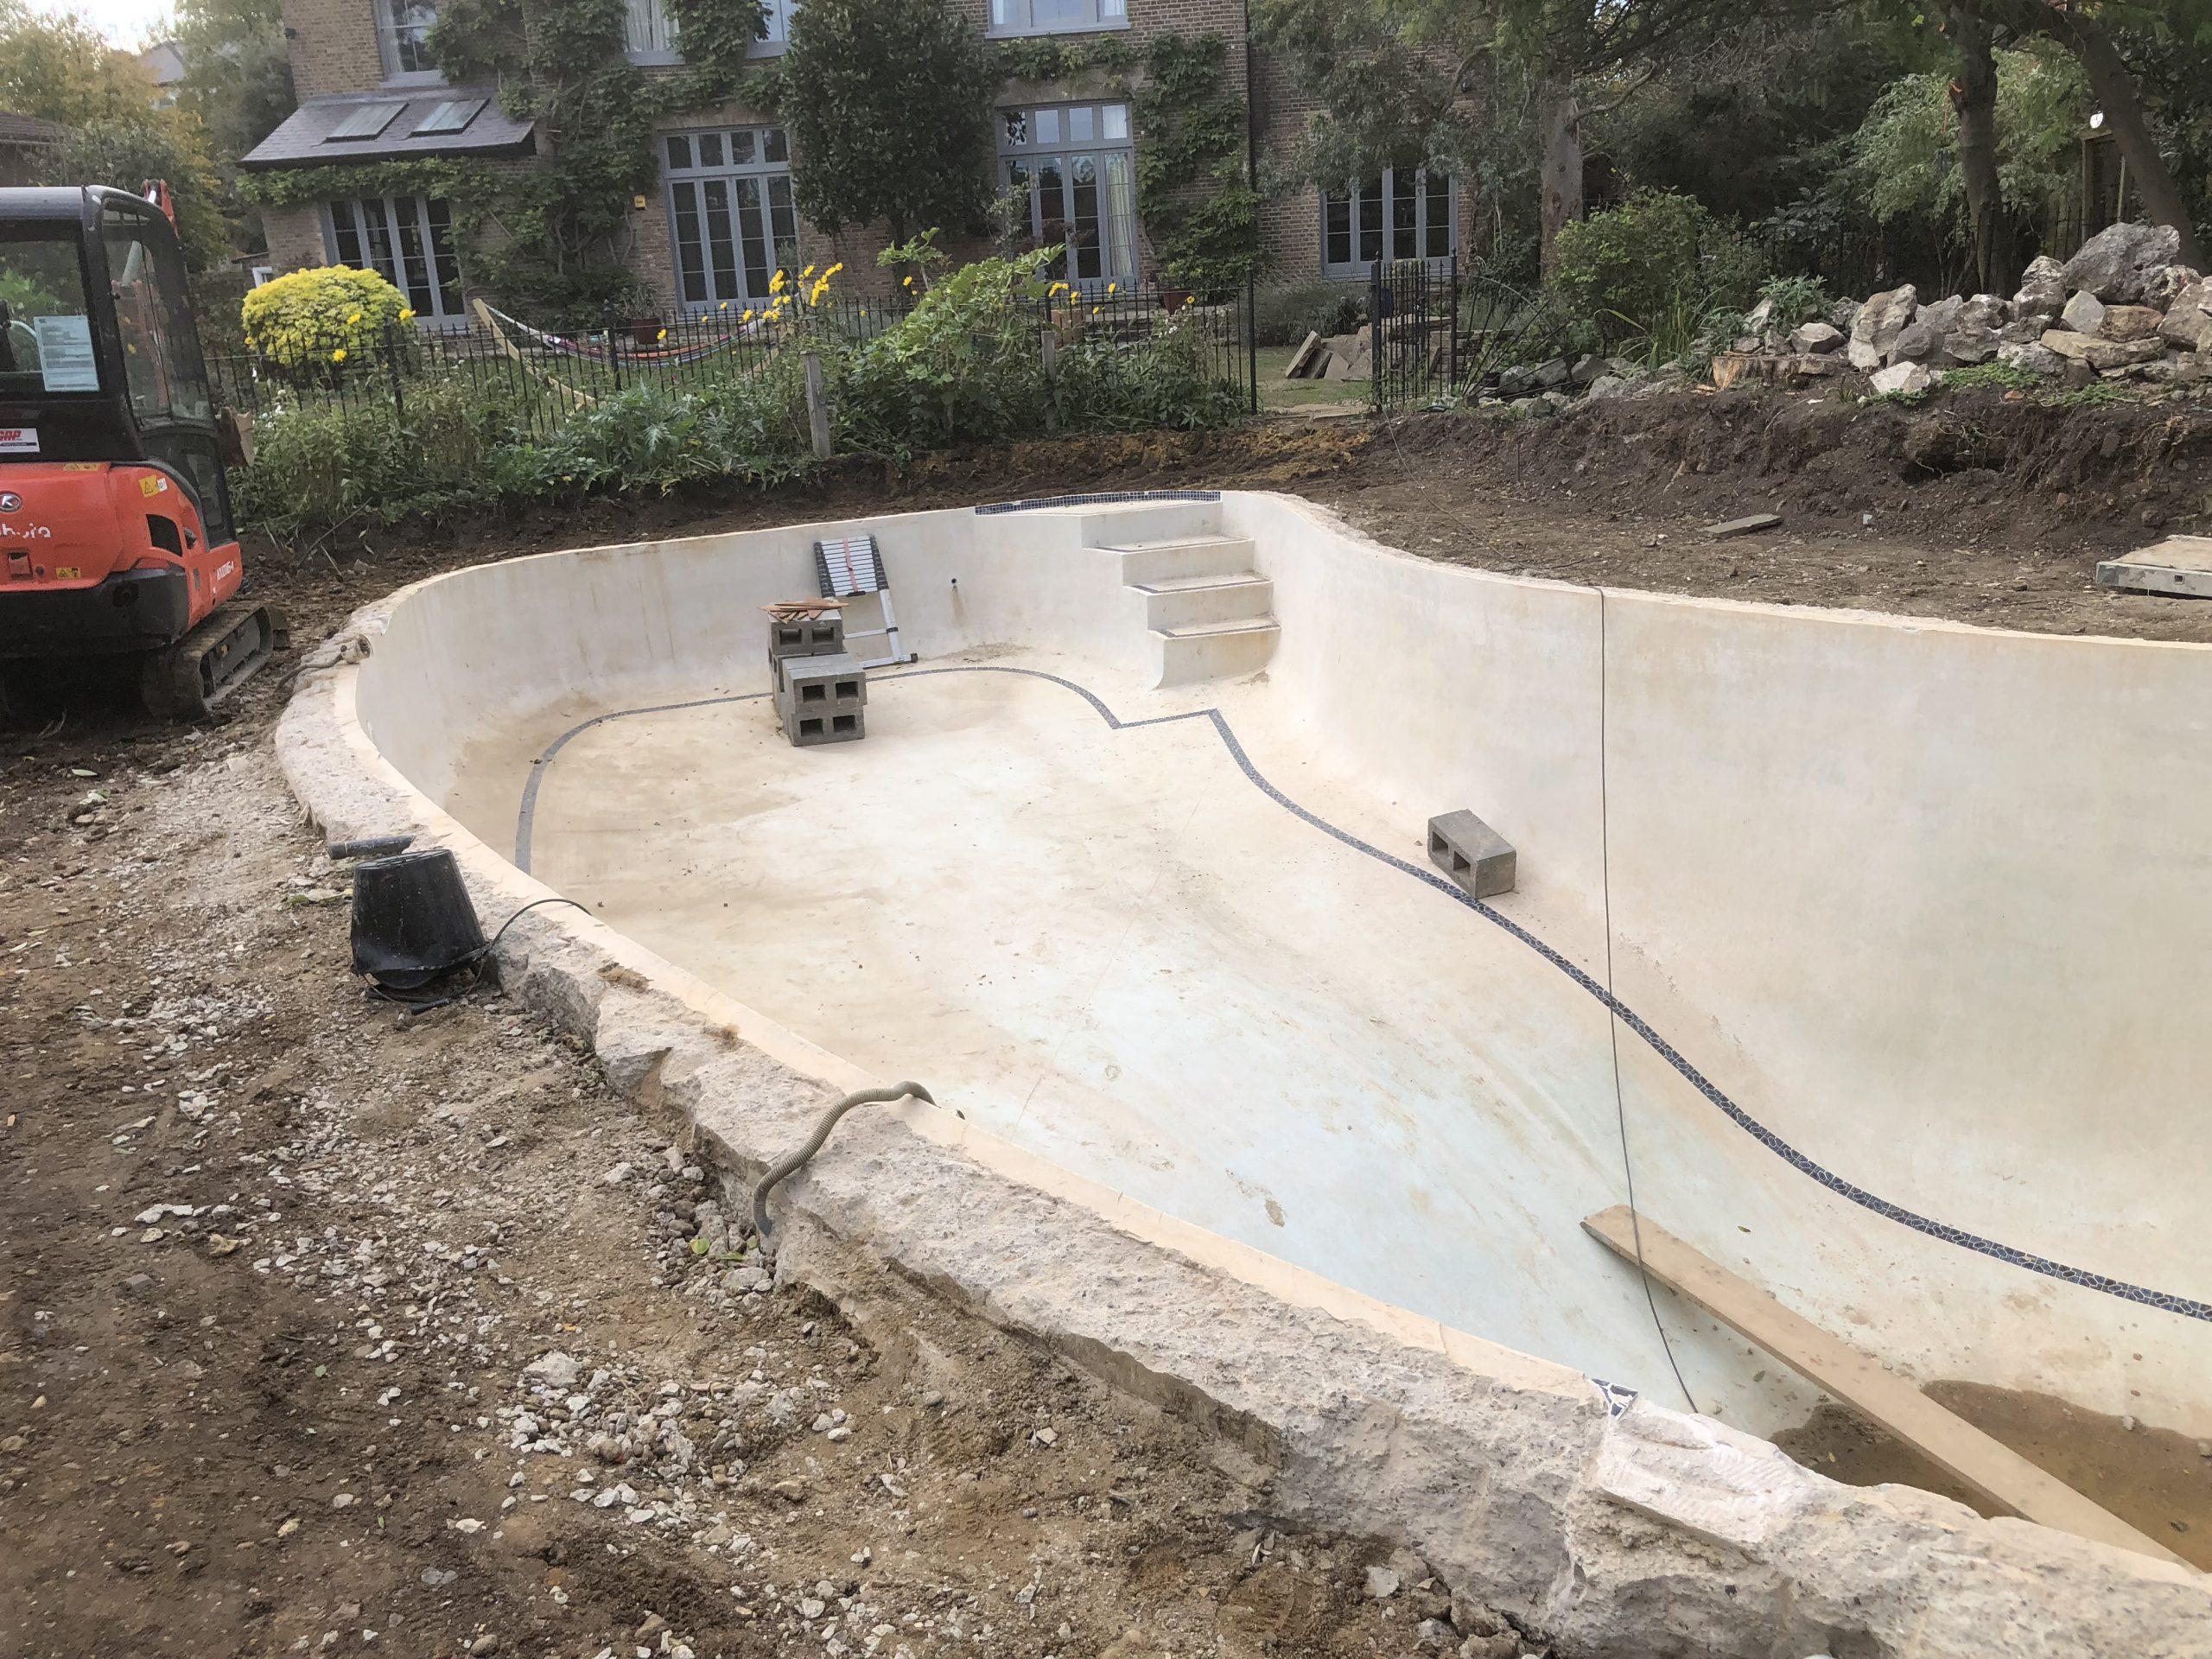 Countryhouse Swimming Pool Refurb